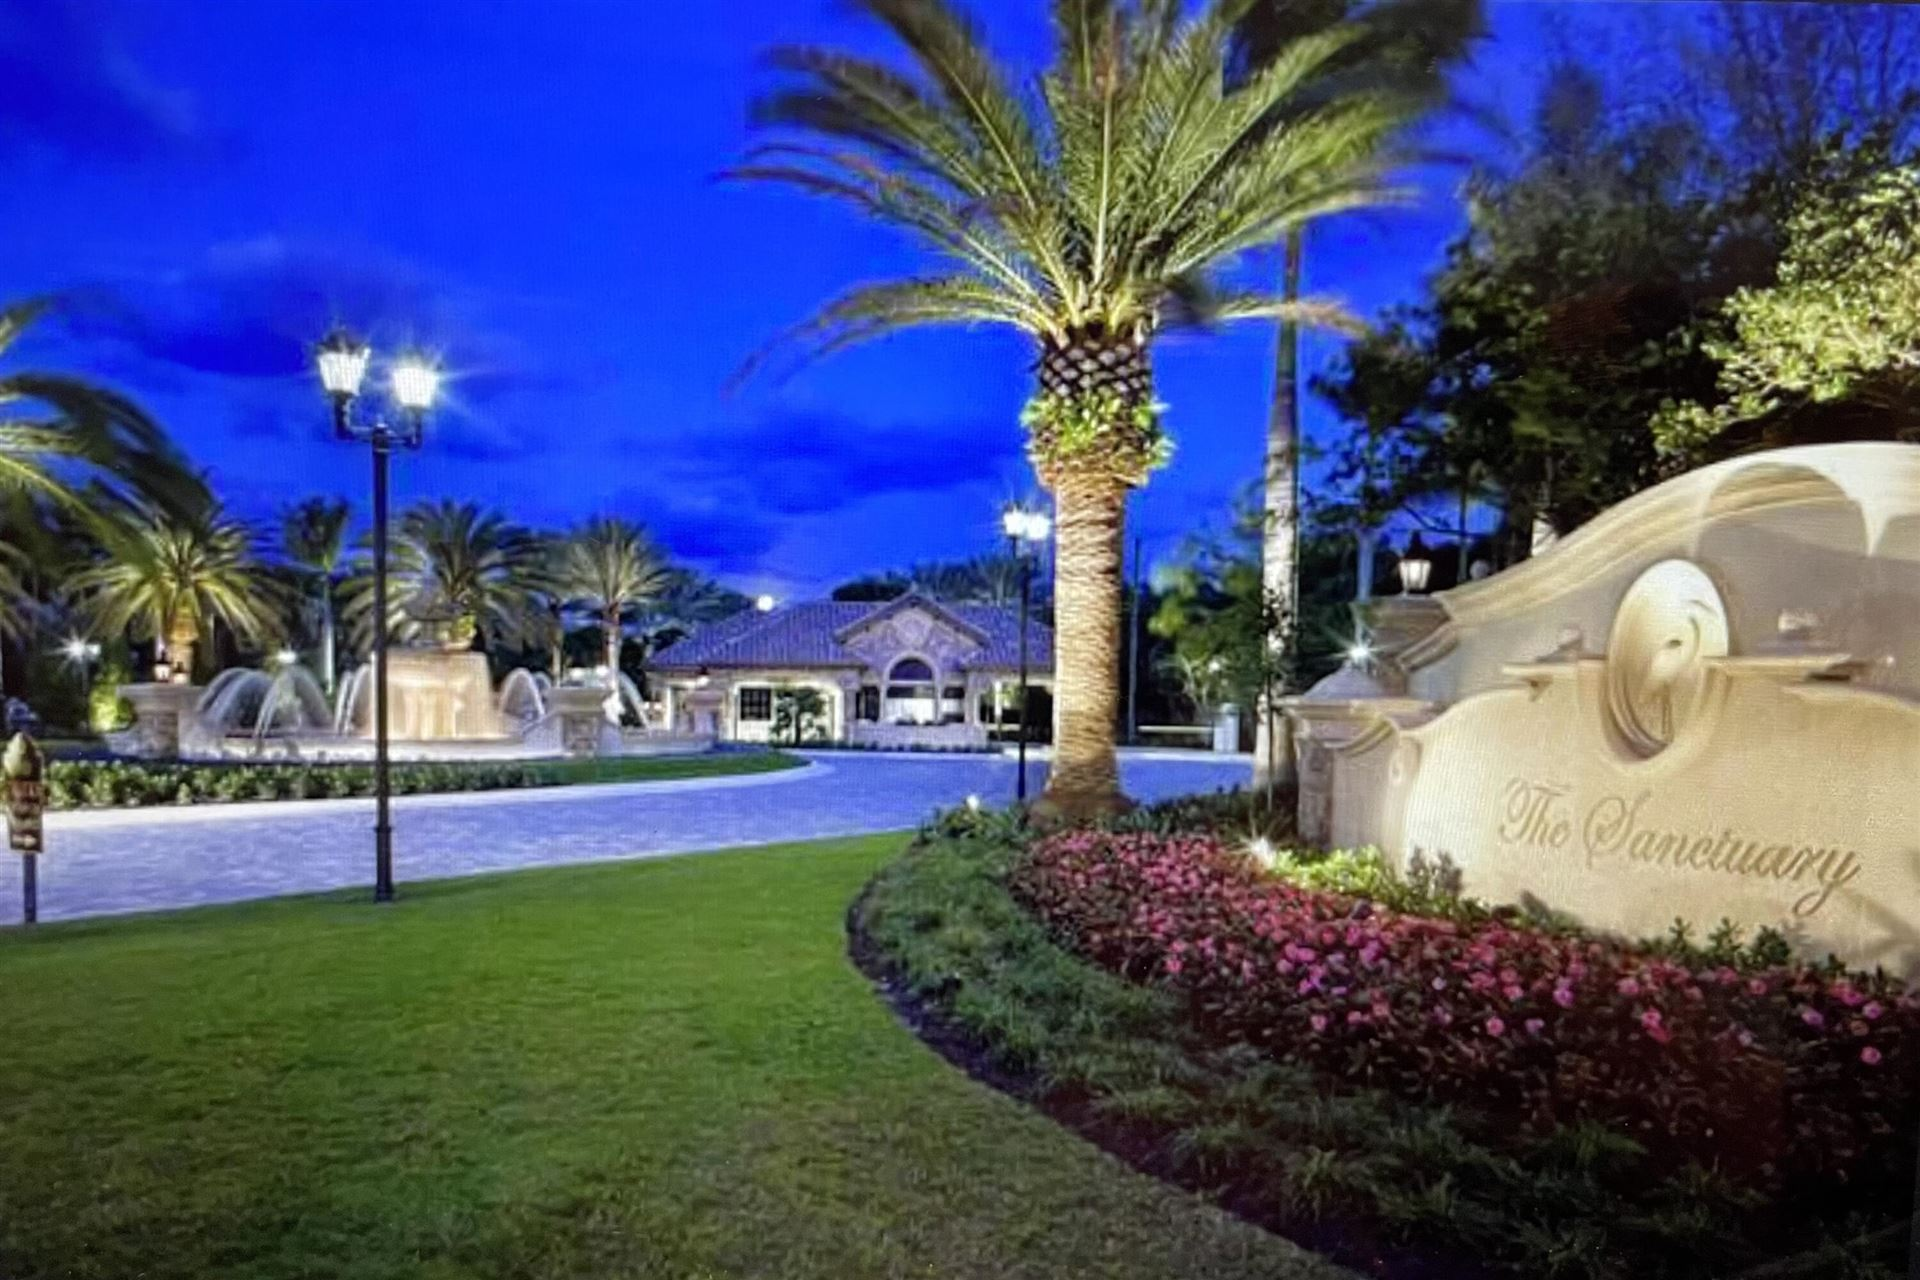 Photo of 525 Sandpiper Way, Boca Raton, FL 33431 (MLS # RX-10753519)